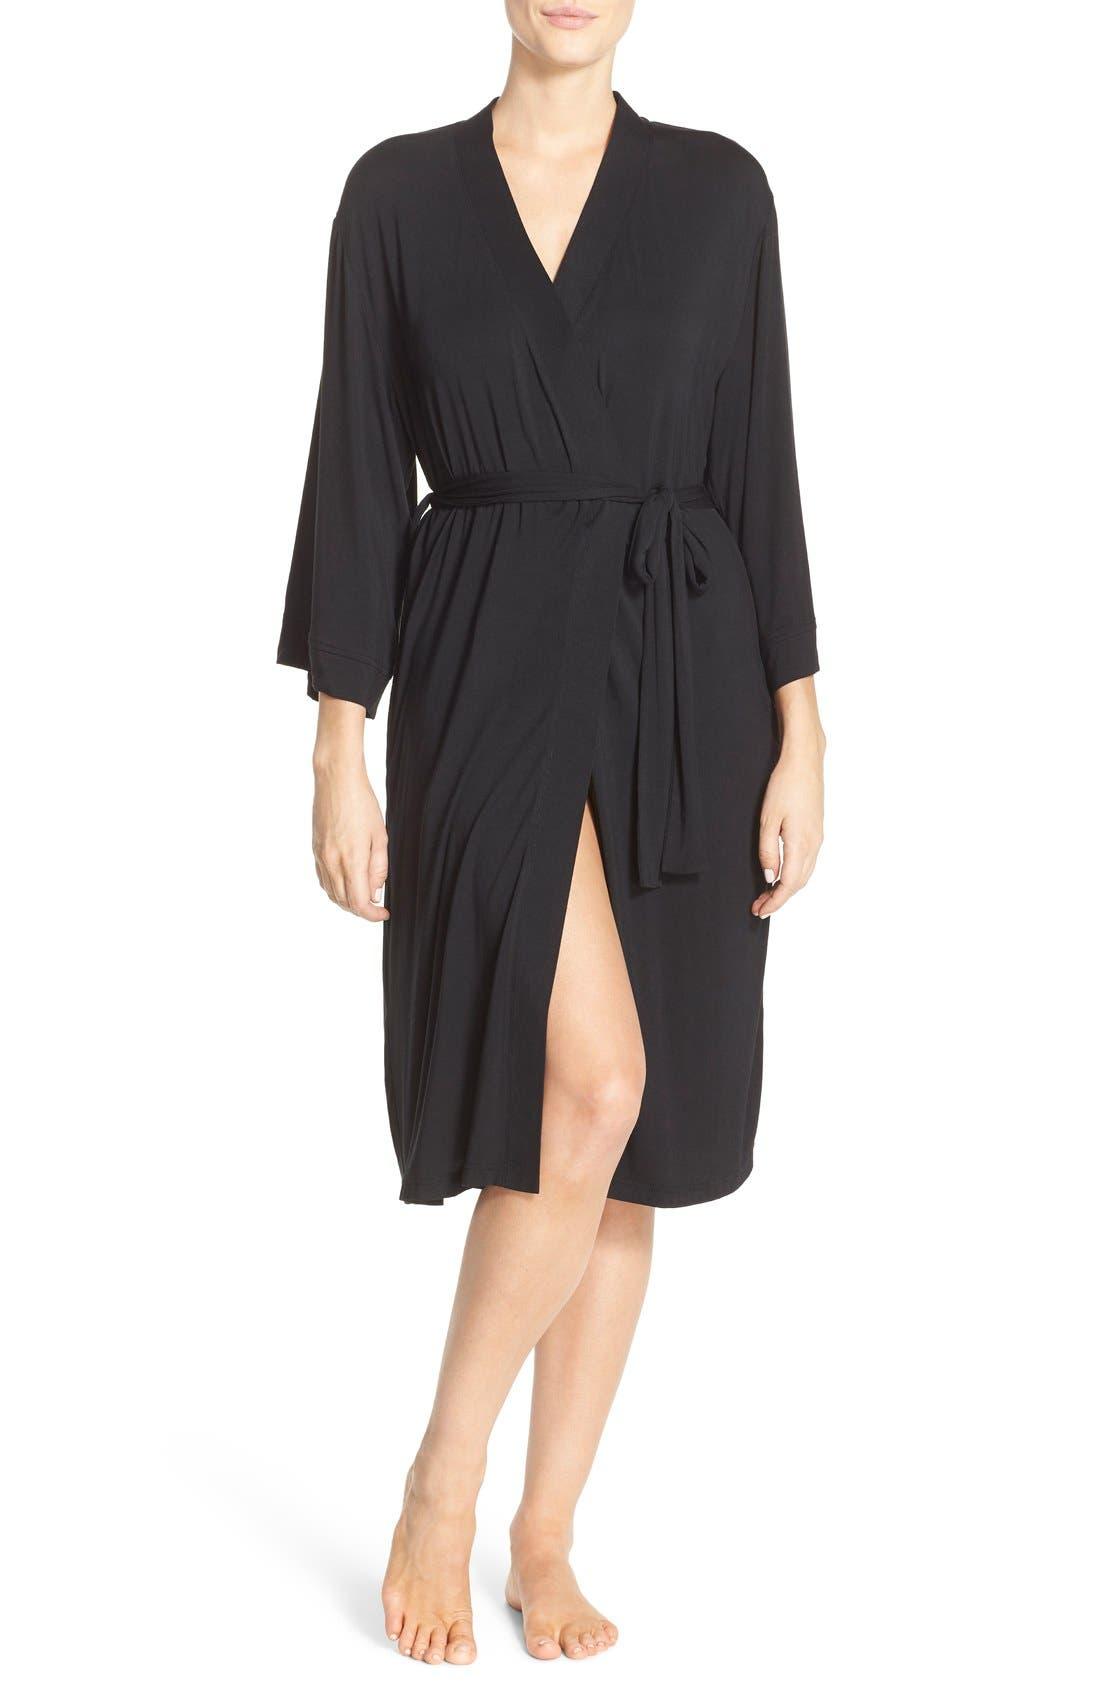 Main Image - Nordstrom Lingerie 'Moonlight' Jersey Robe